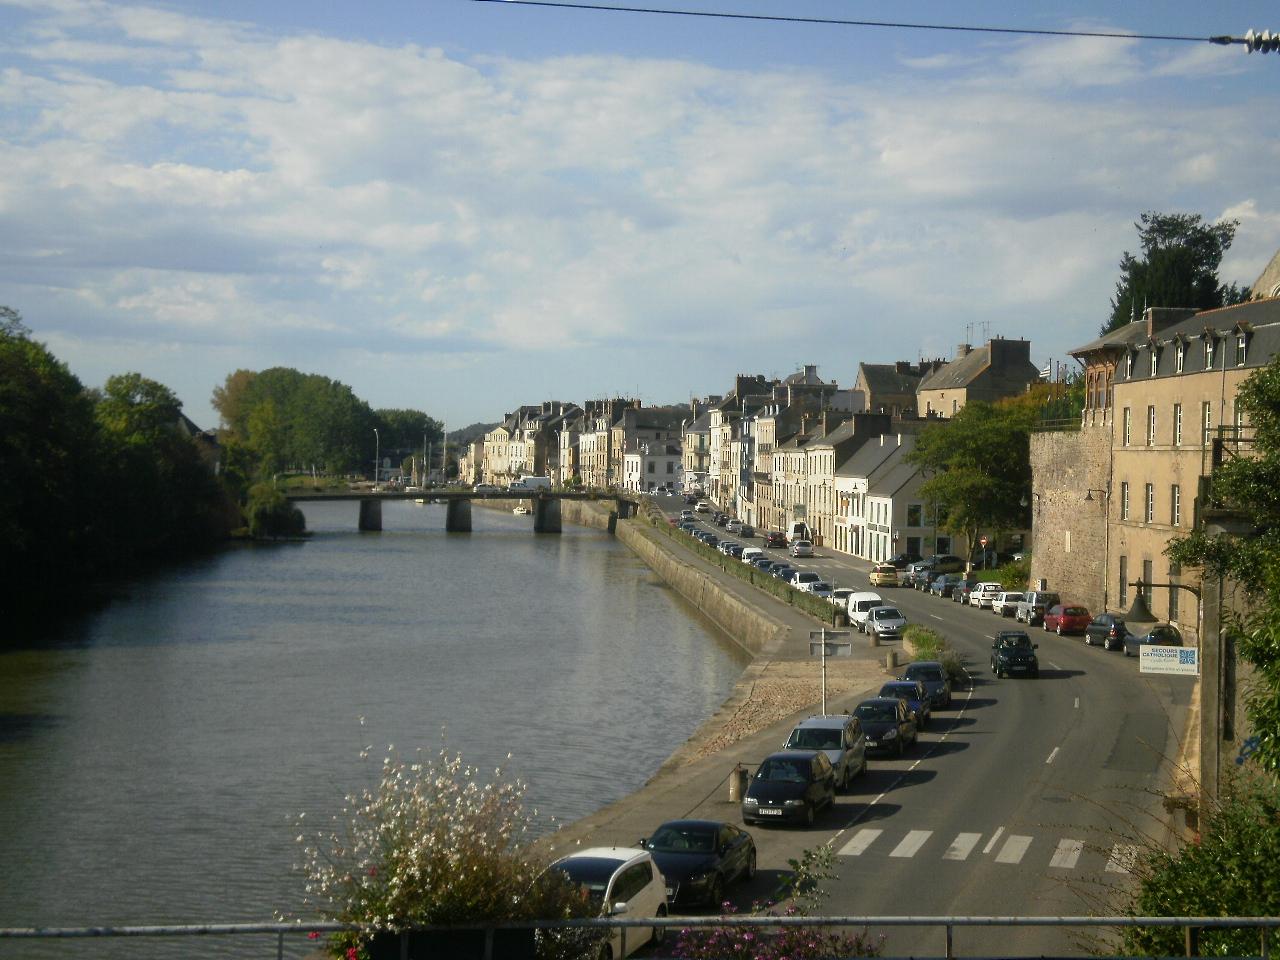 File:La Vilaine redon.JPG - Wikimedia Commons